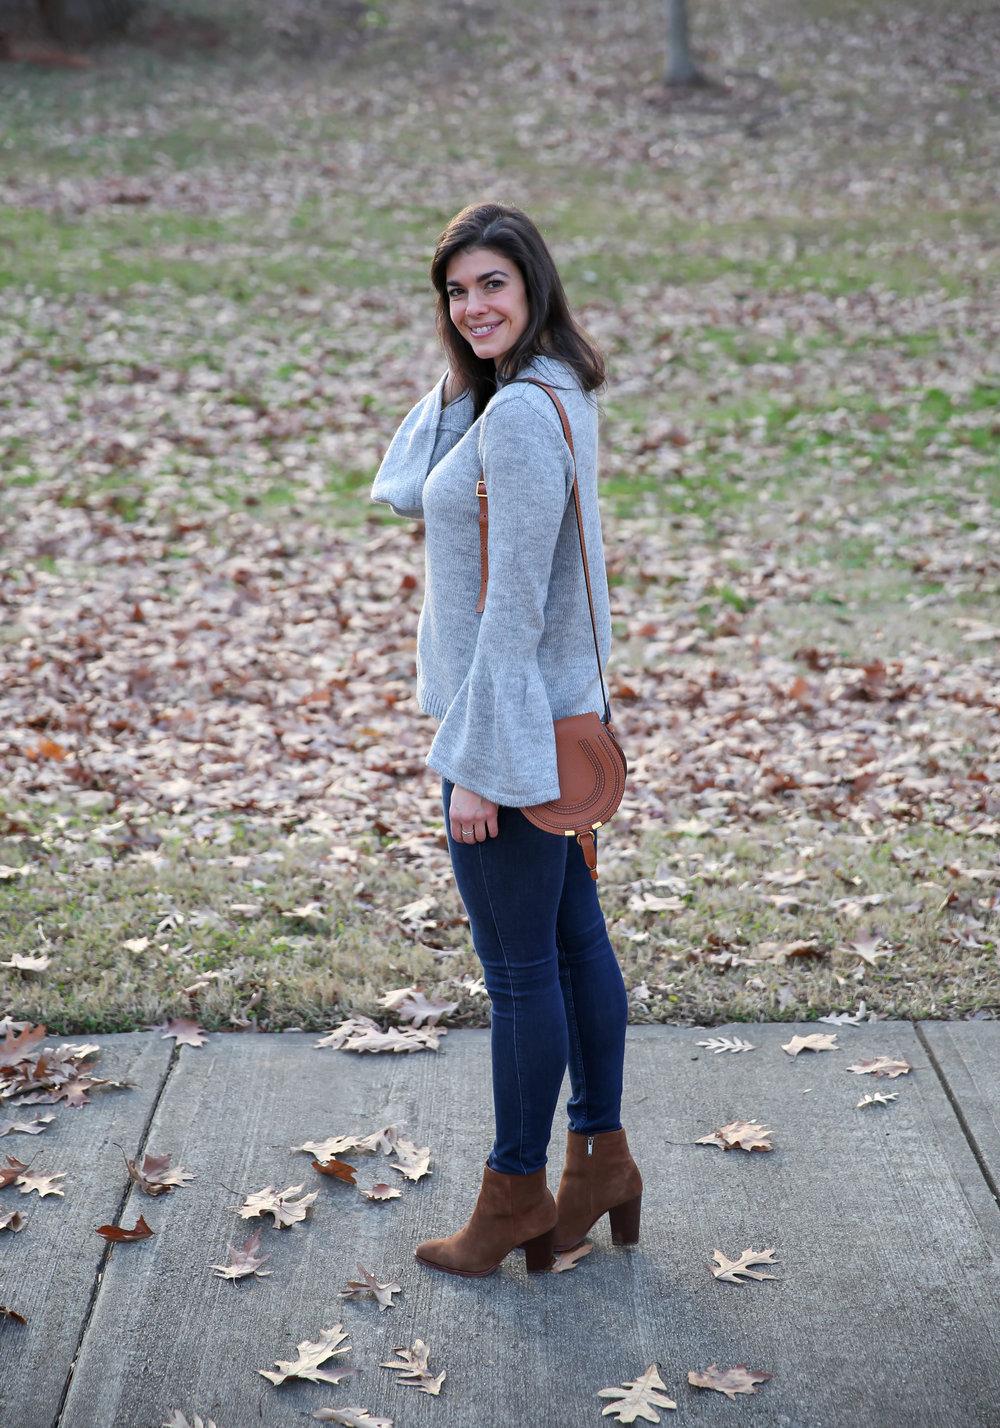 skinny-blue-jeans-grey-sweater-winter-ootd-lauren-schwaiger-blog.jpg